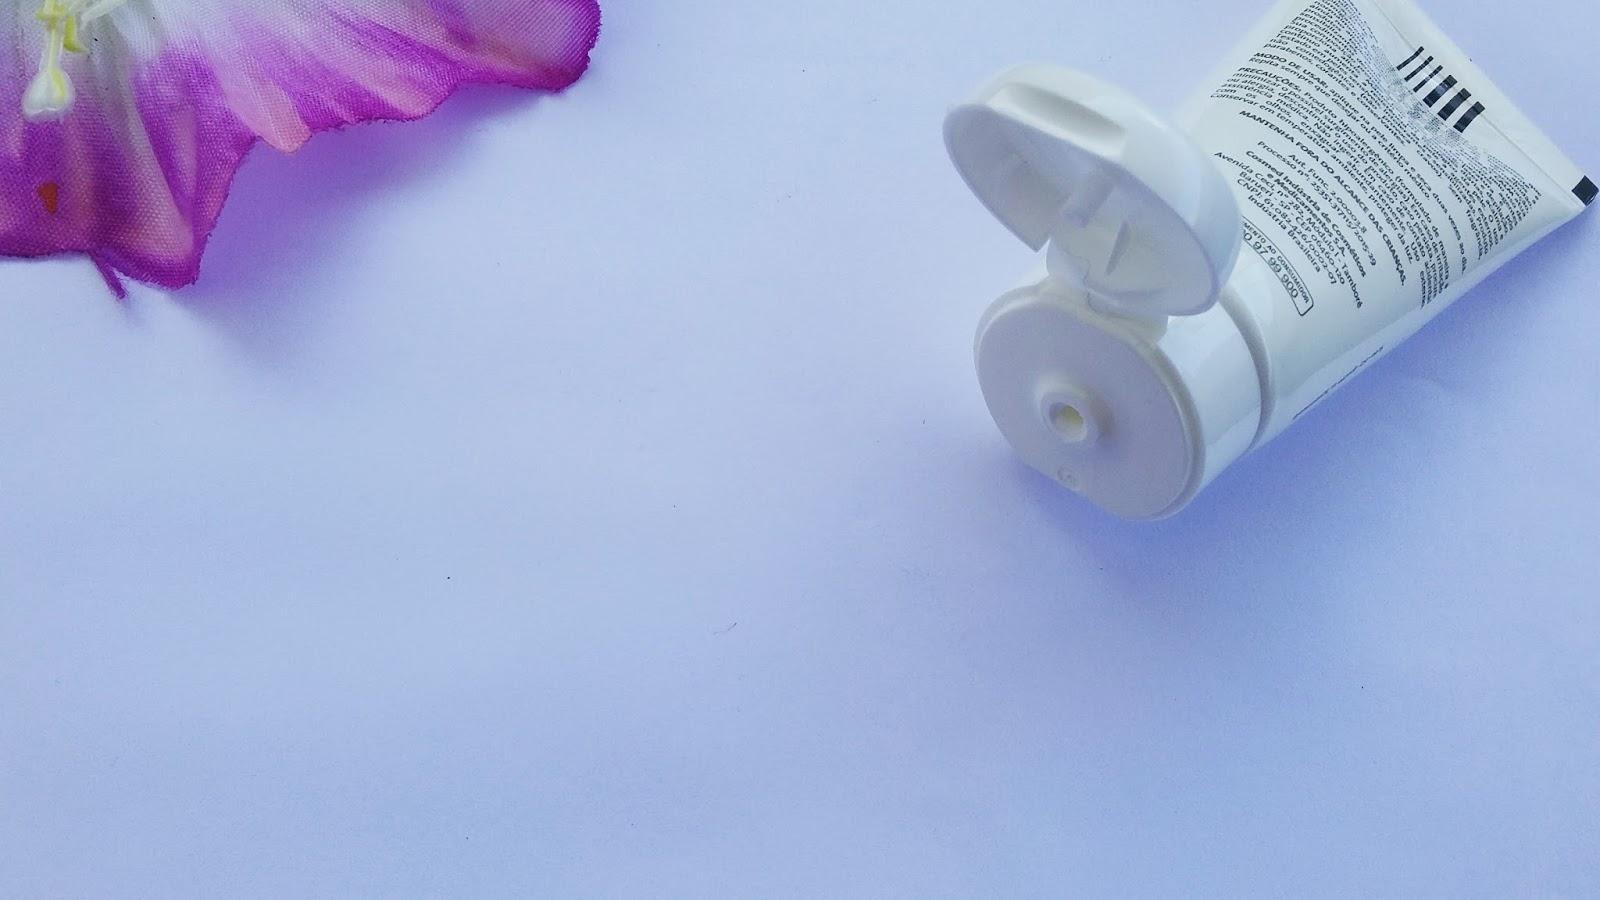 Resenha: Hidratante Facial Epidrat Calm da Mantecorp